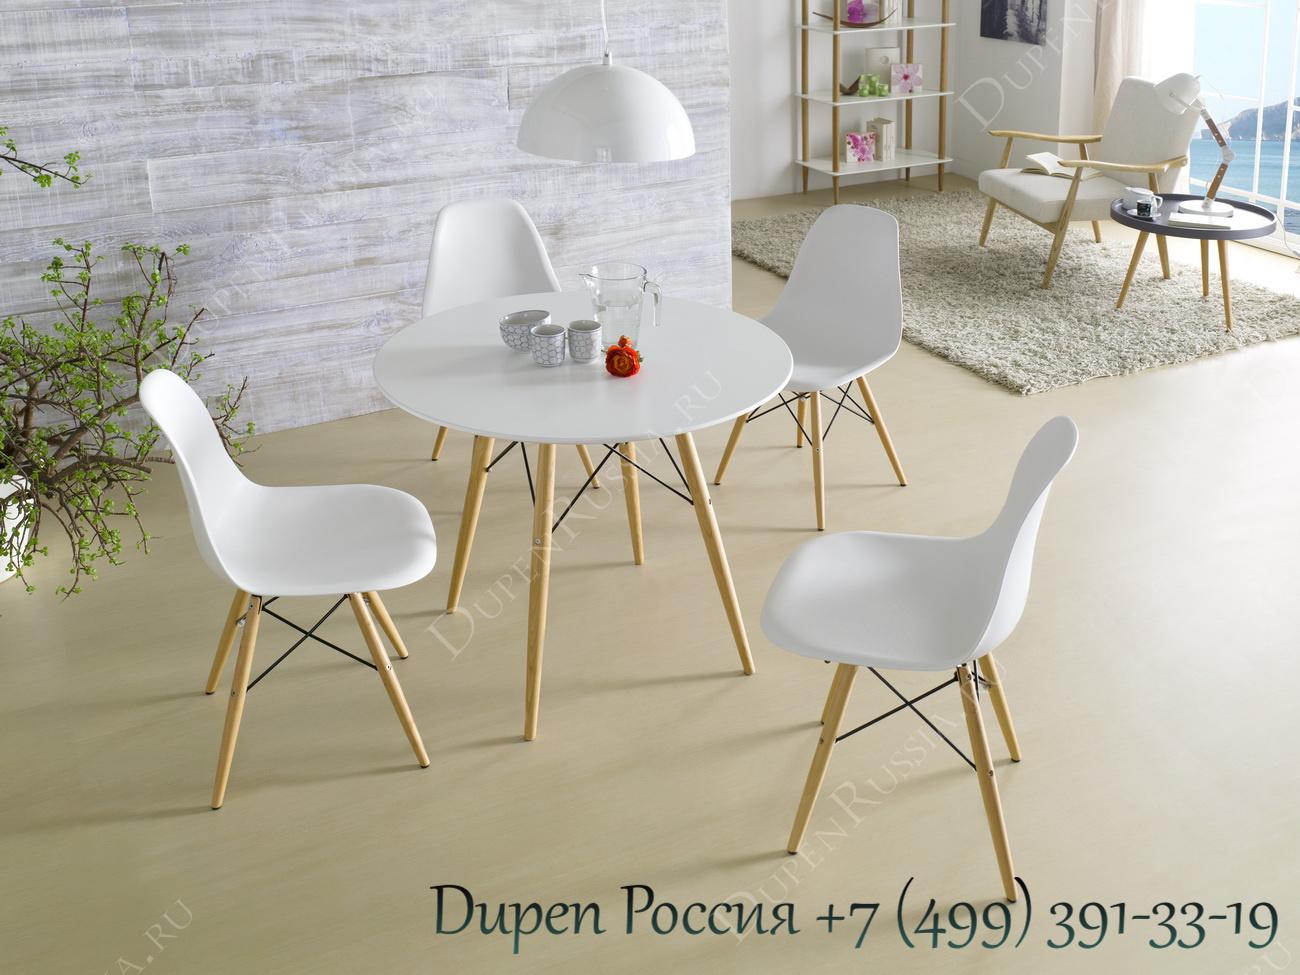 Стол DUPEN RT-901, Стулья DUPEN DC-231A Белые